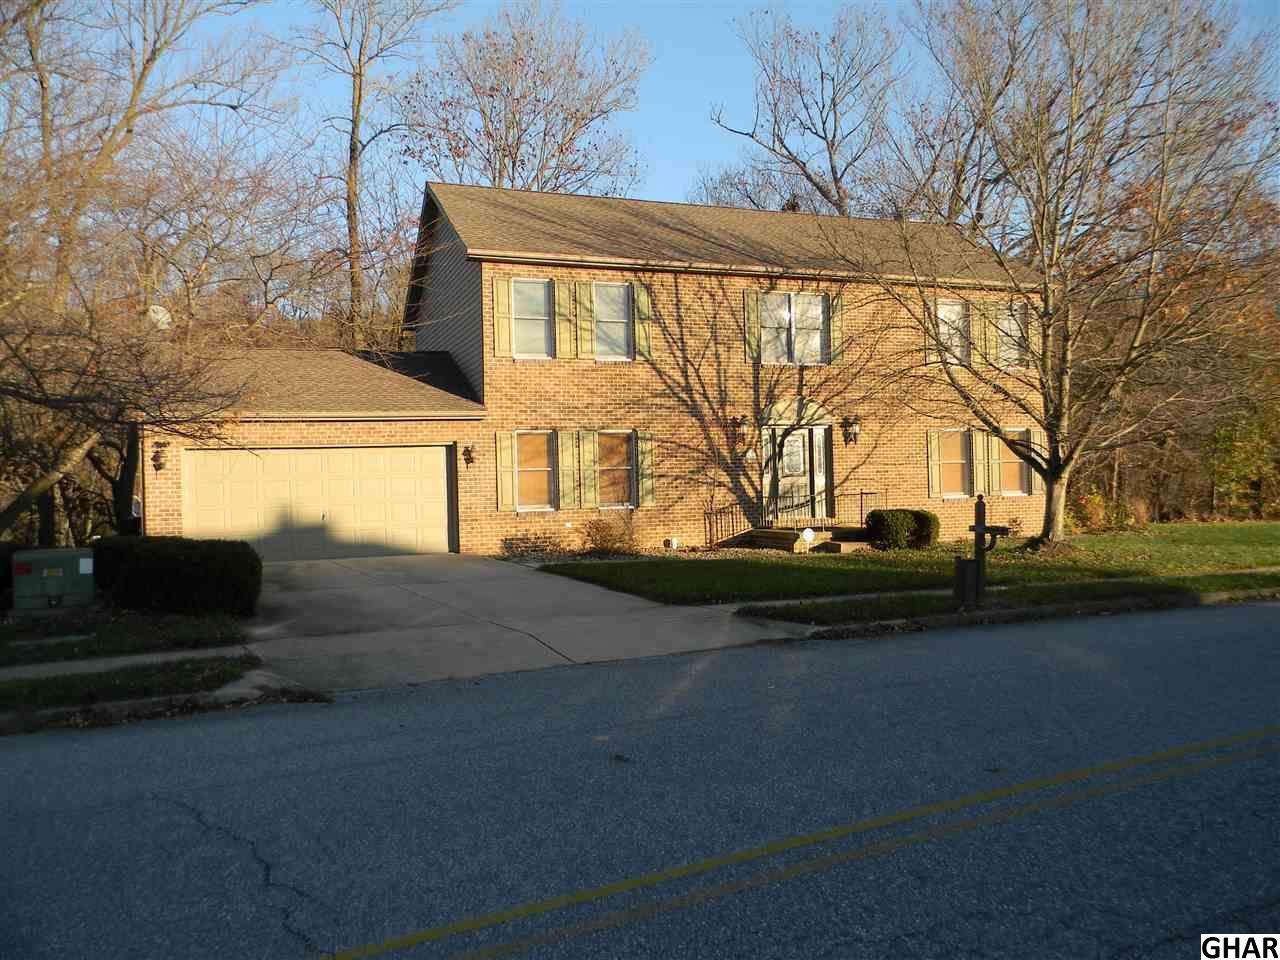 Rental Homes for Rent, ListingId:36058832, location: 874 Acri Road Mechanicsburg 17050